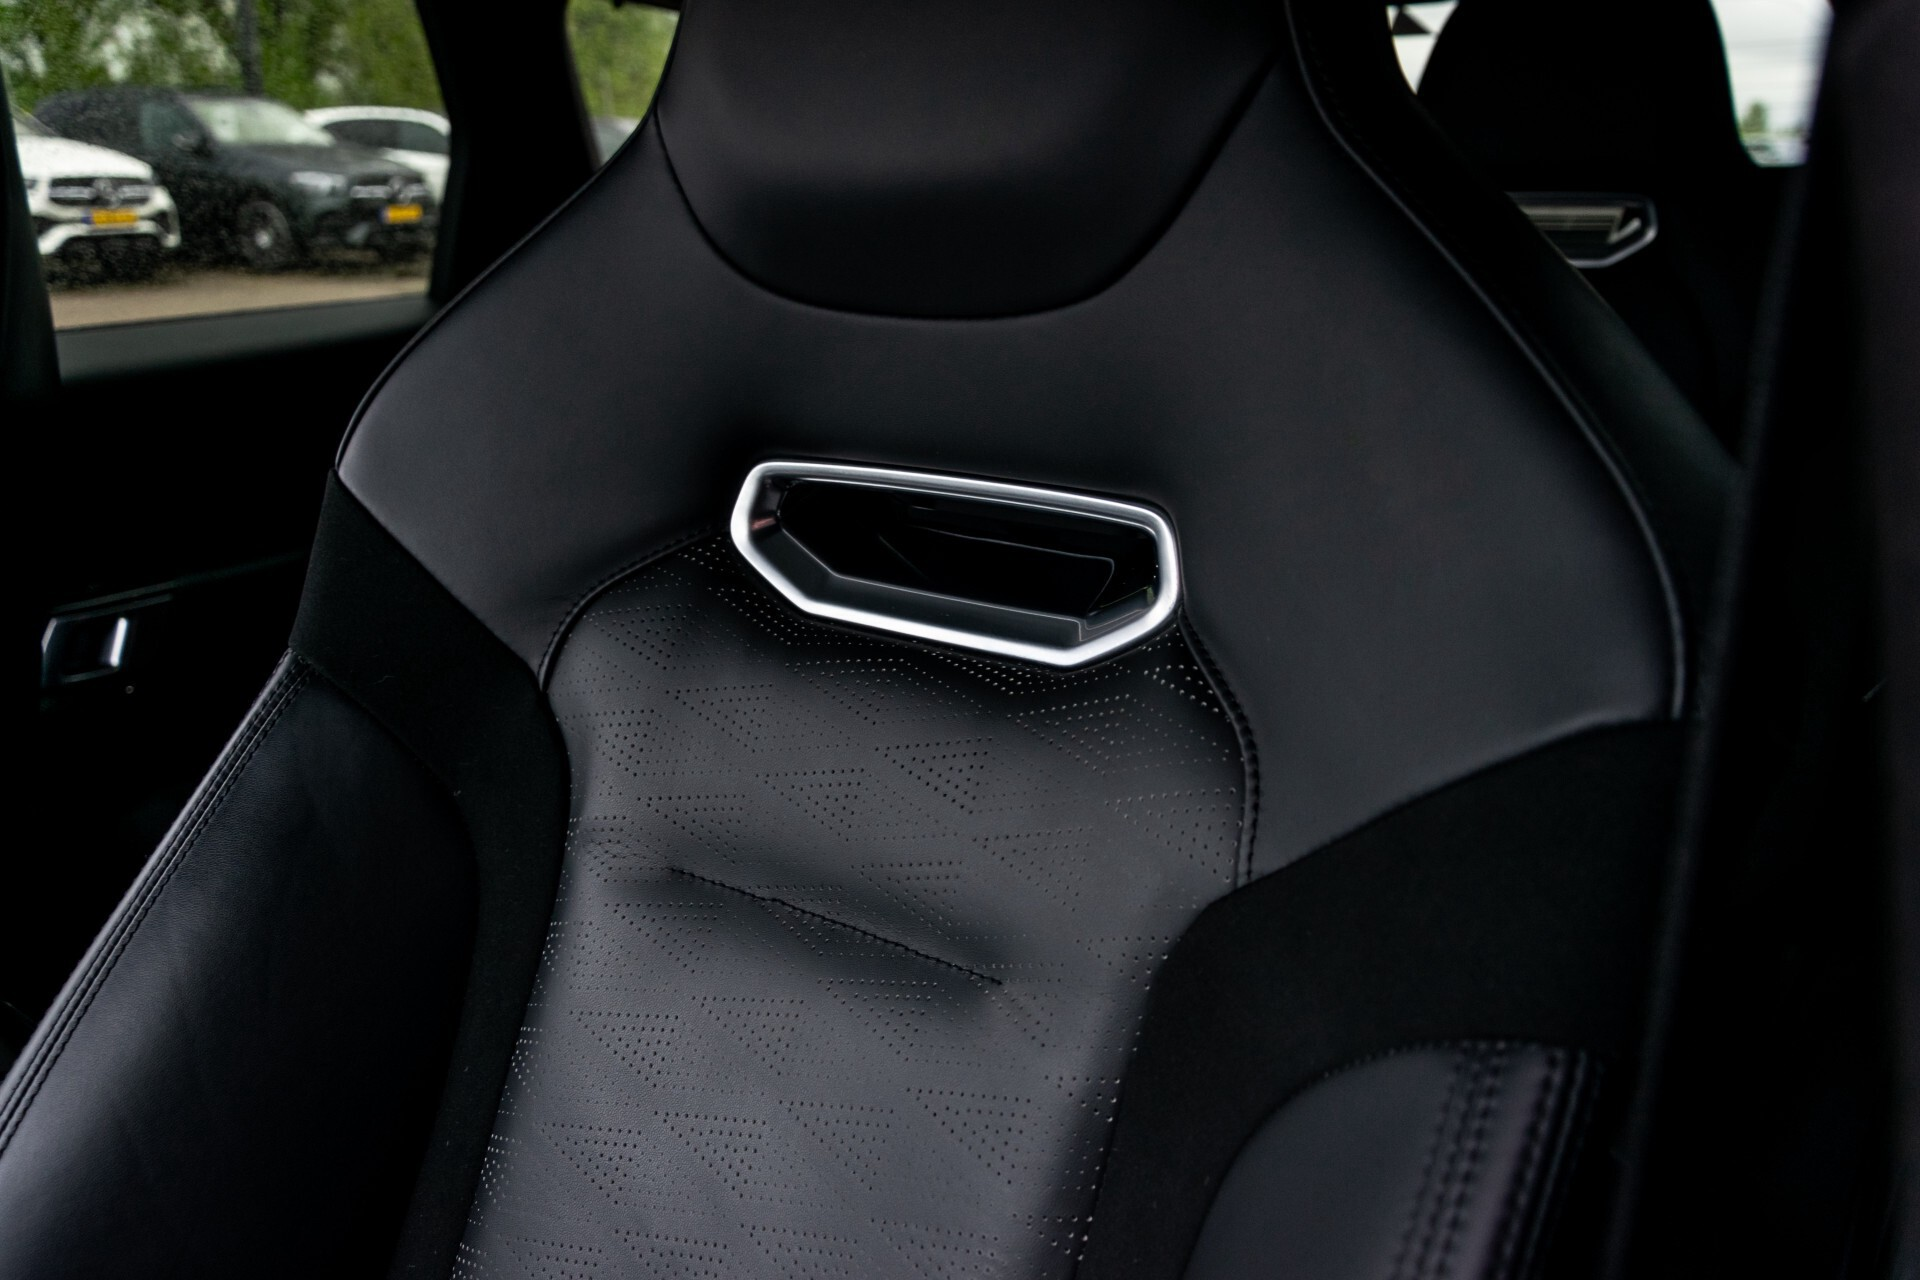 Land Rover Range Rover Sport SVR 5.0 Supercharged 575pk Full Carbon Nieuwprijs €241377 Foto 43